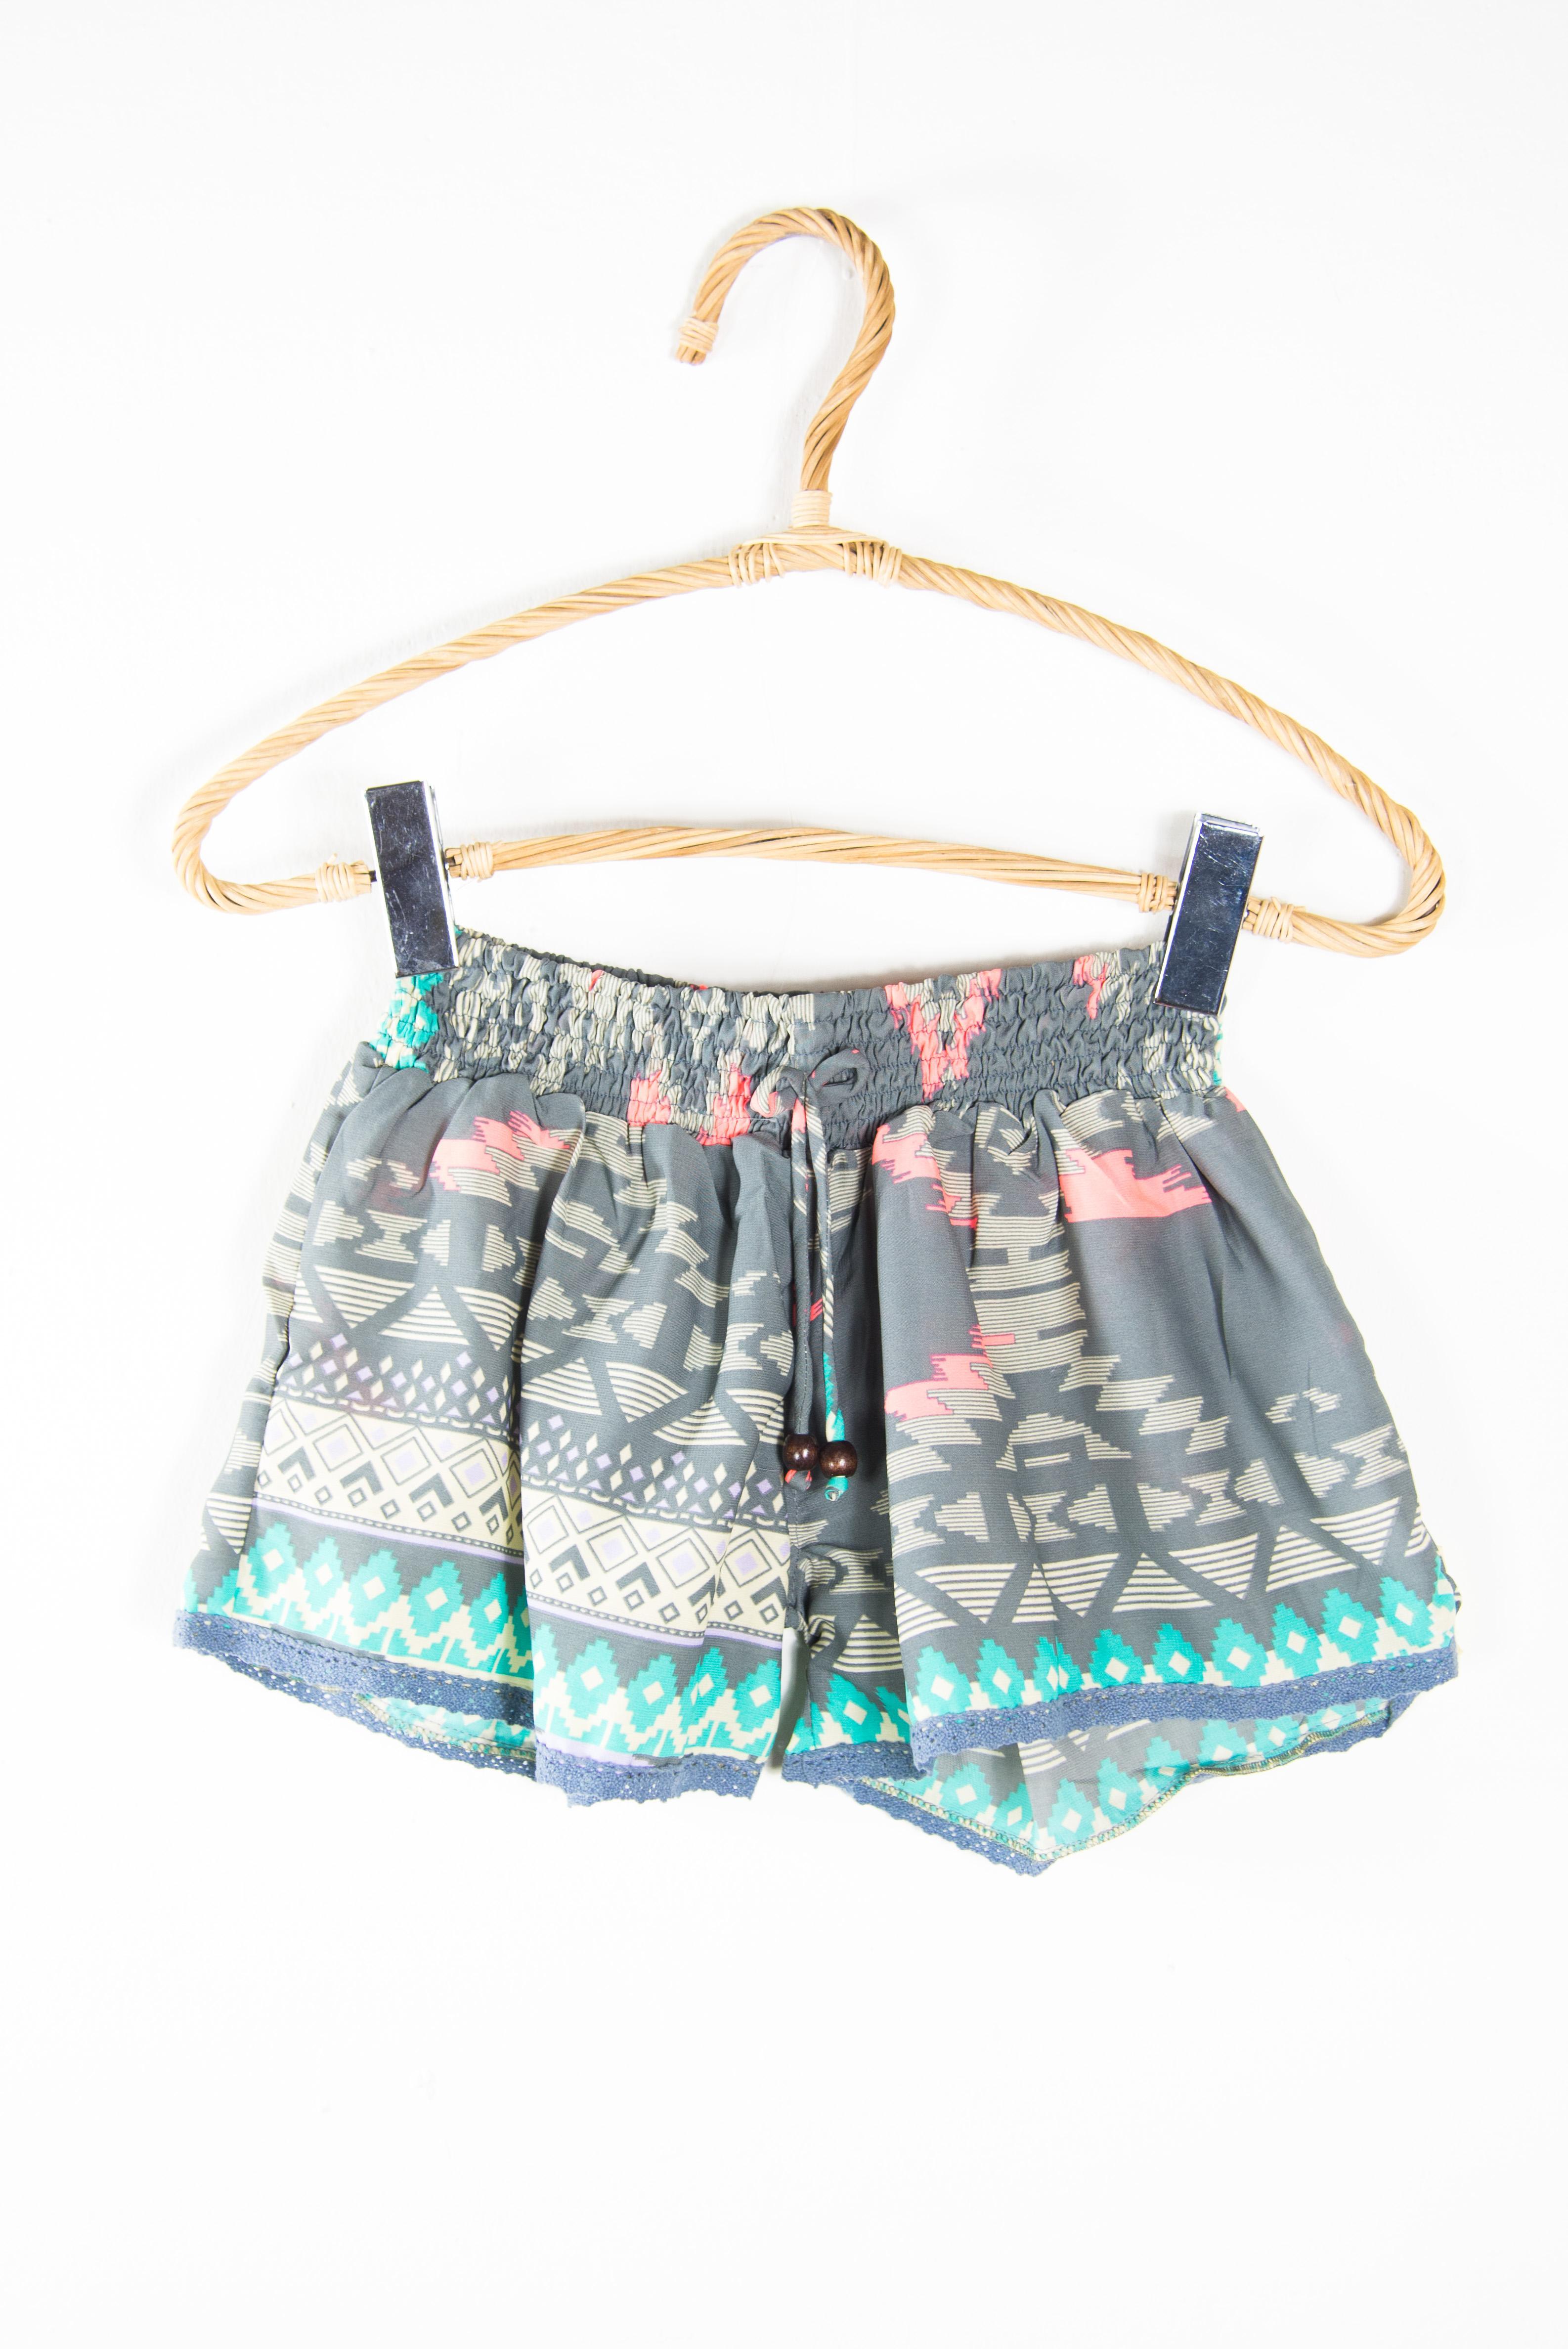 Women's short trousers | Extra short pants